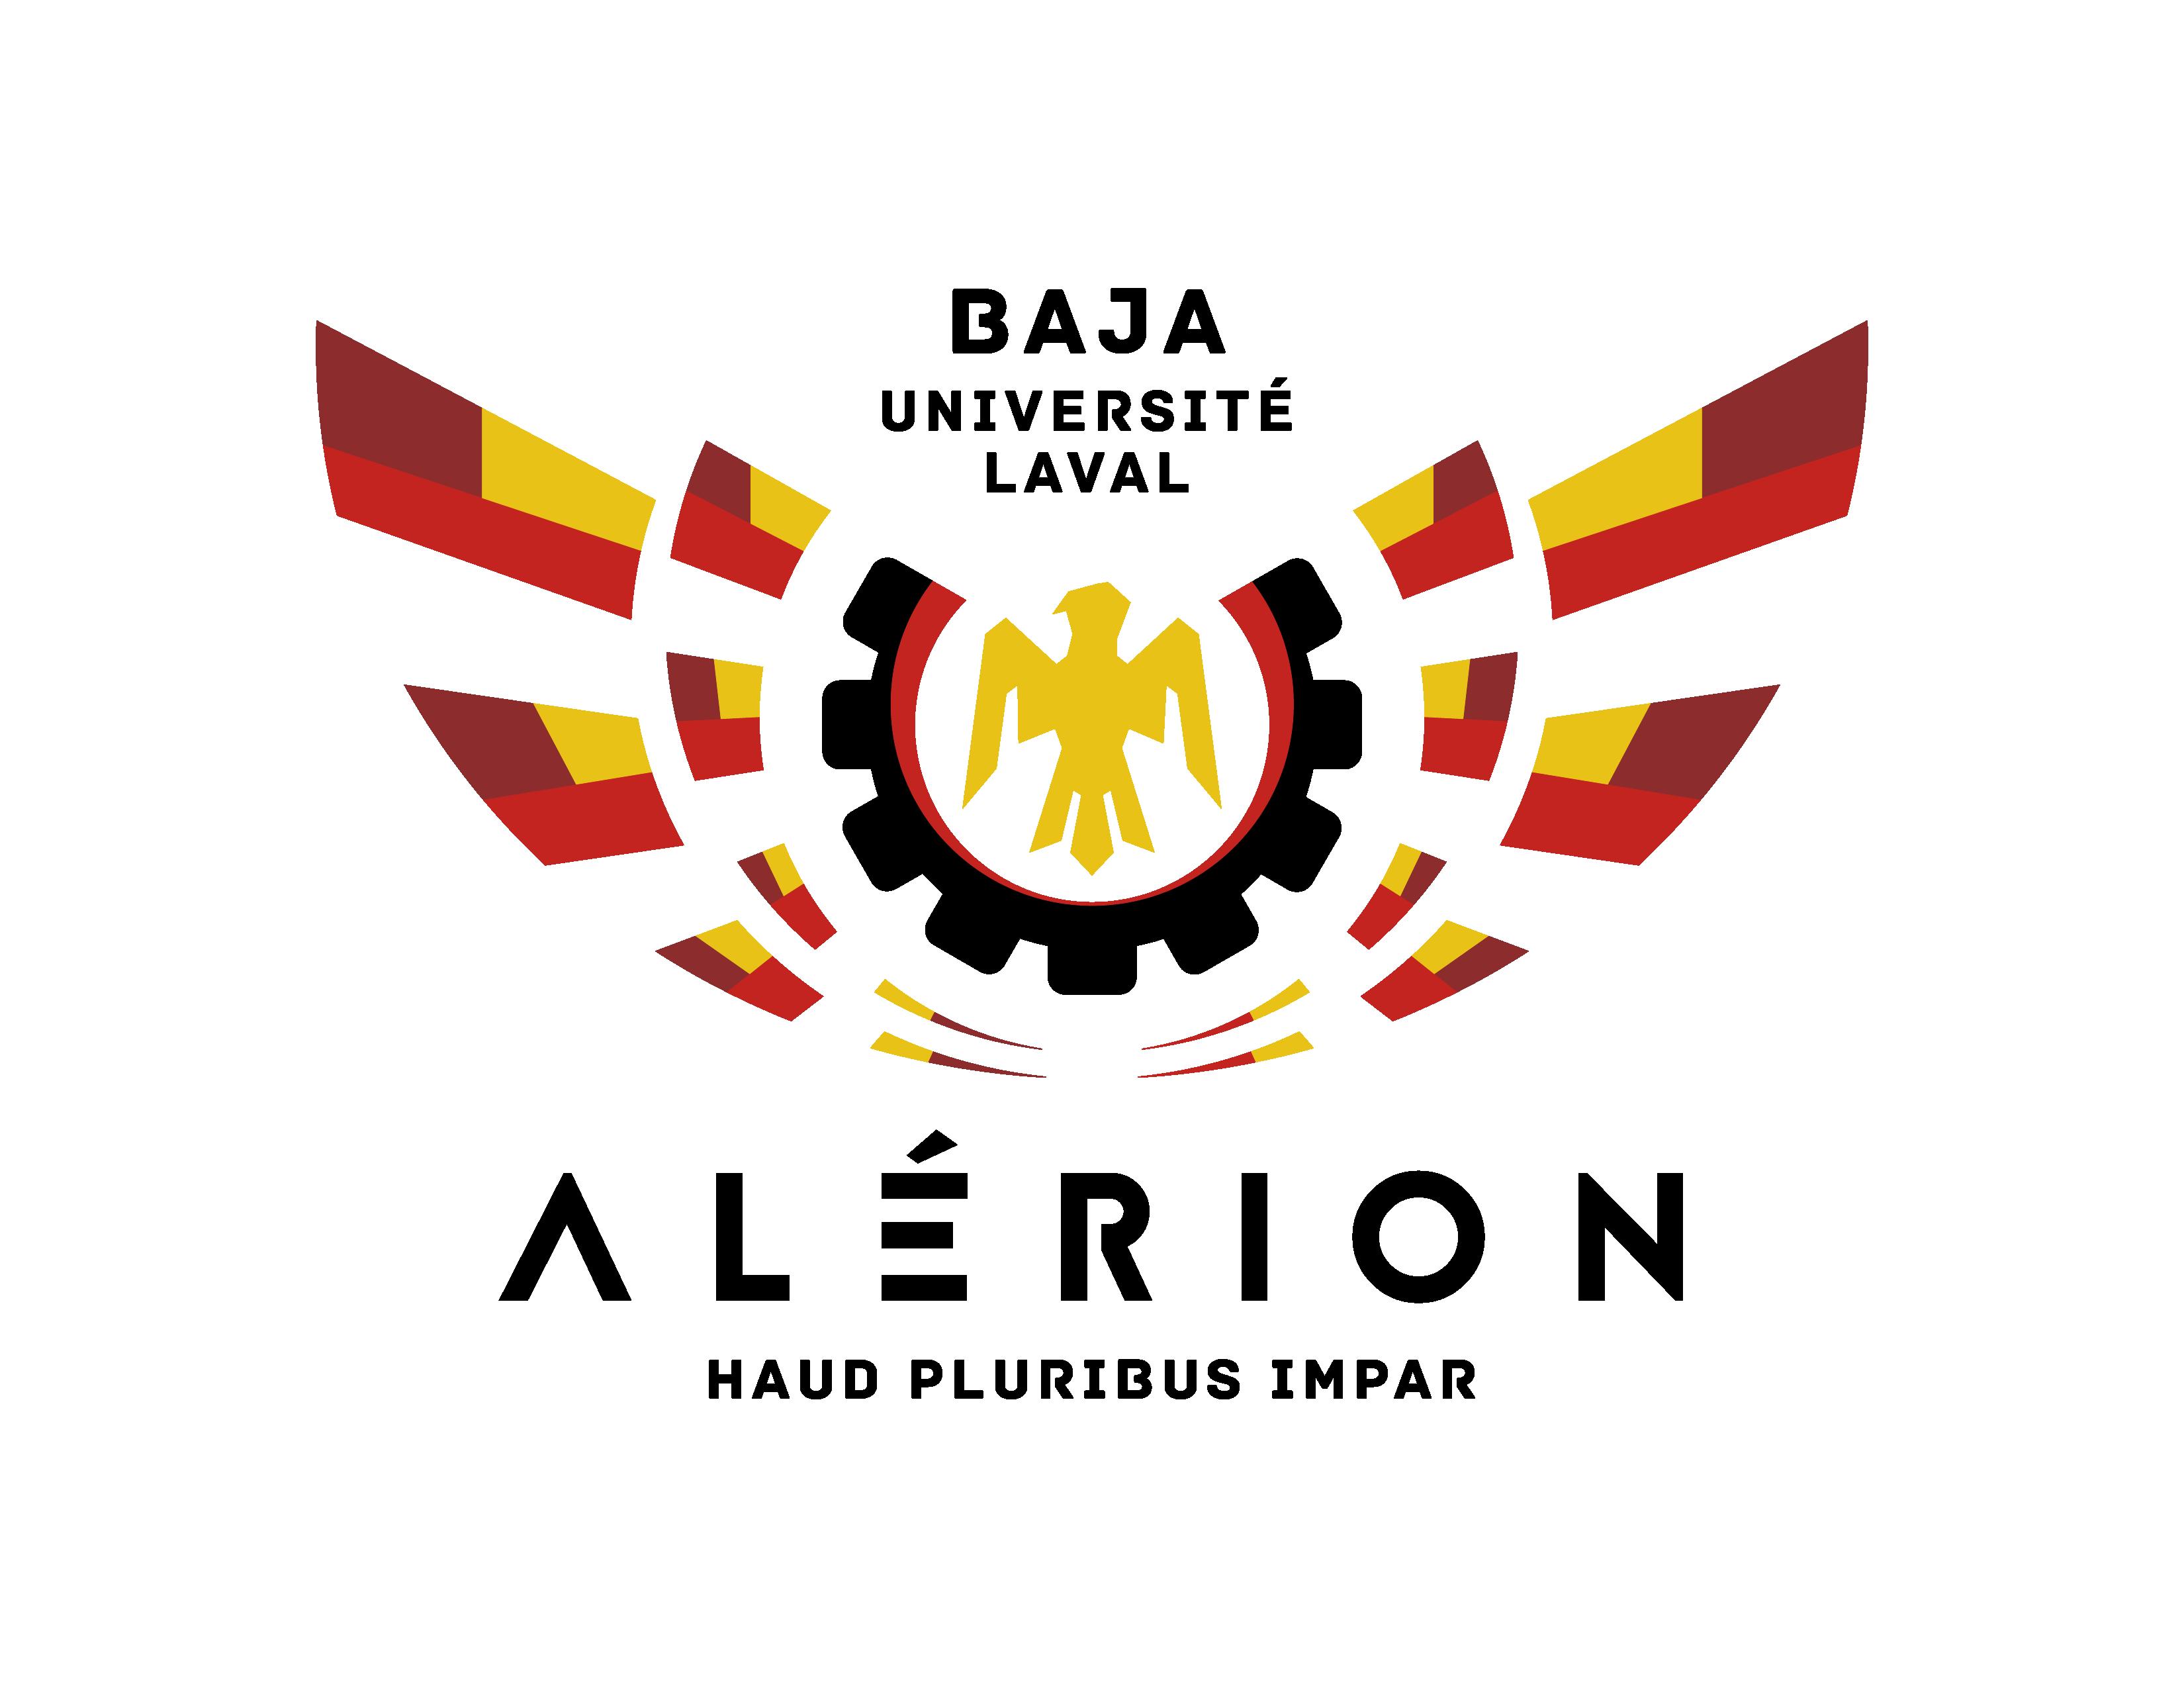 Équipe Baja ULaval